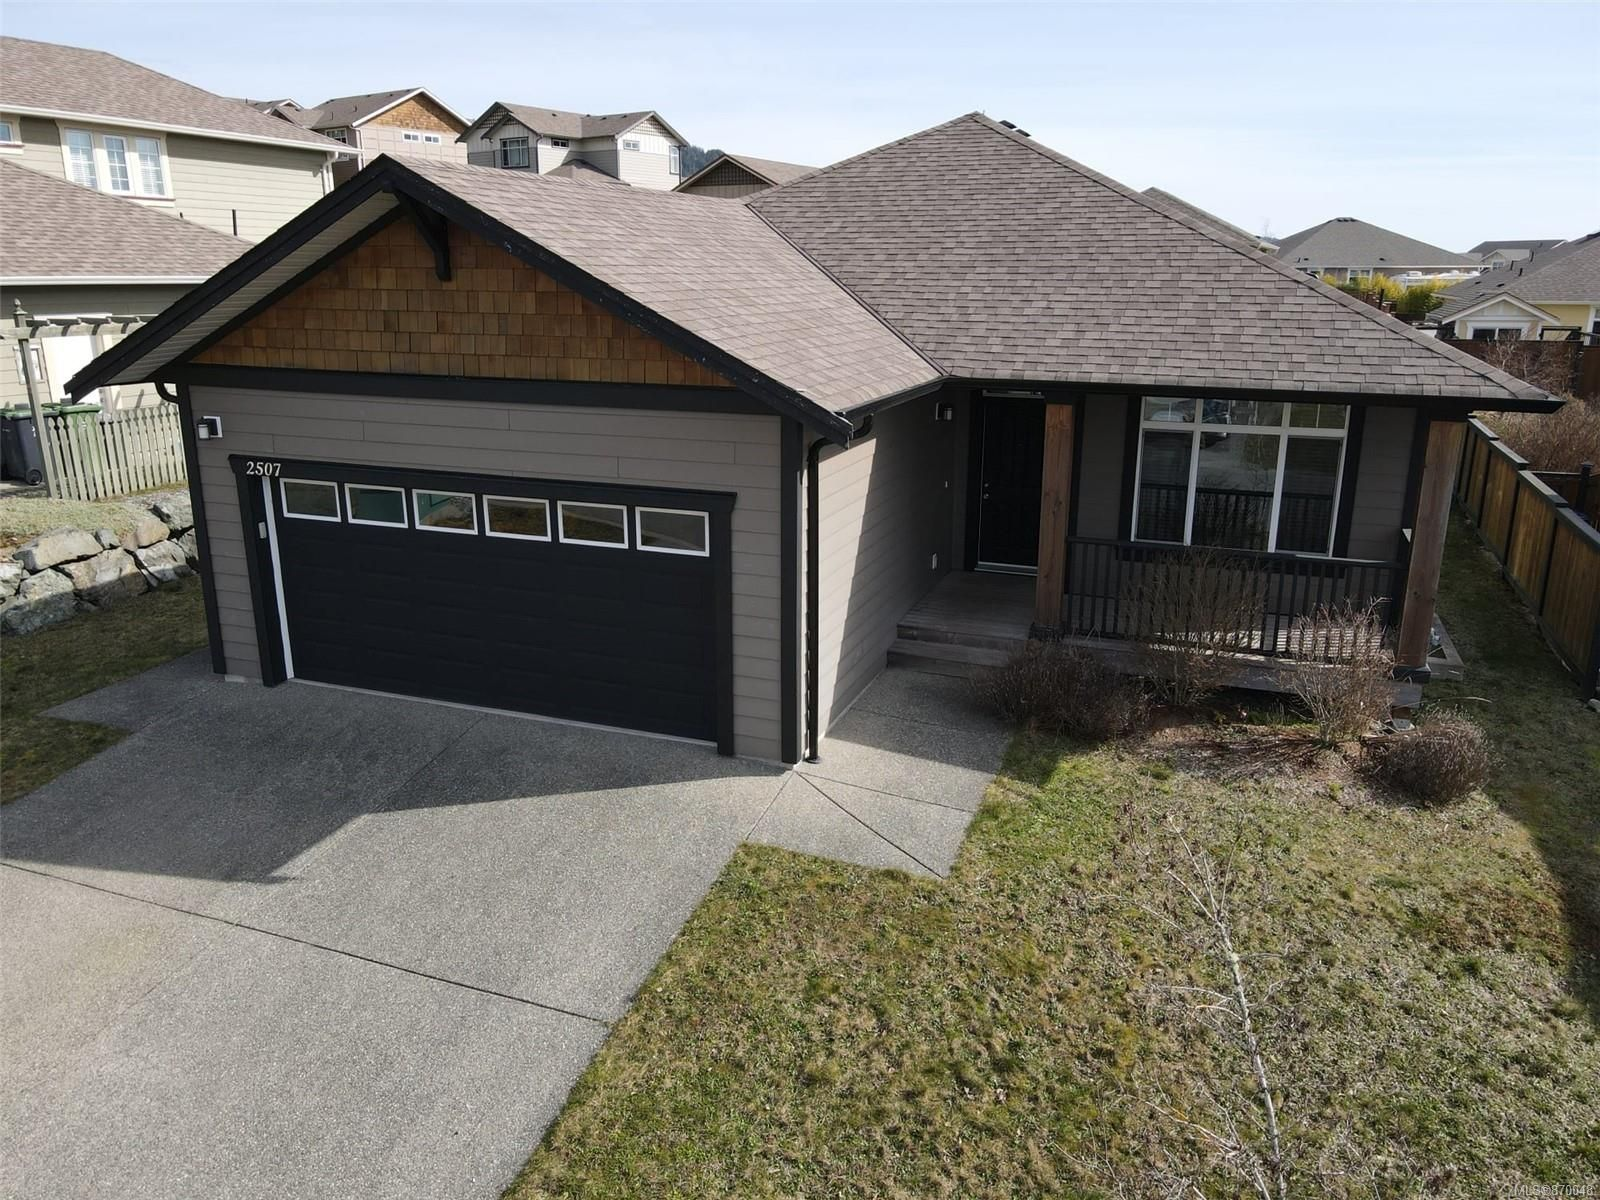 Main Photo: 2507 Watling Way in : Sk Sunriver House for sale (Sooke)  : MLS®# 870048